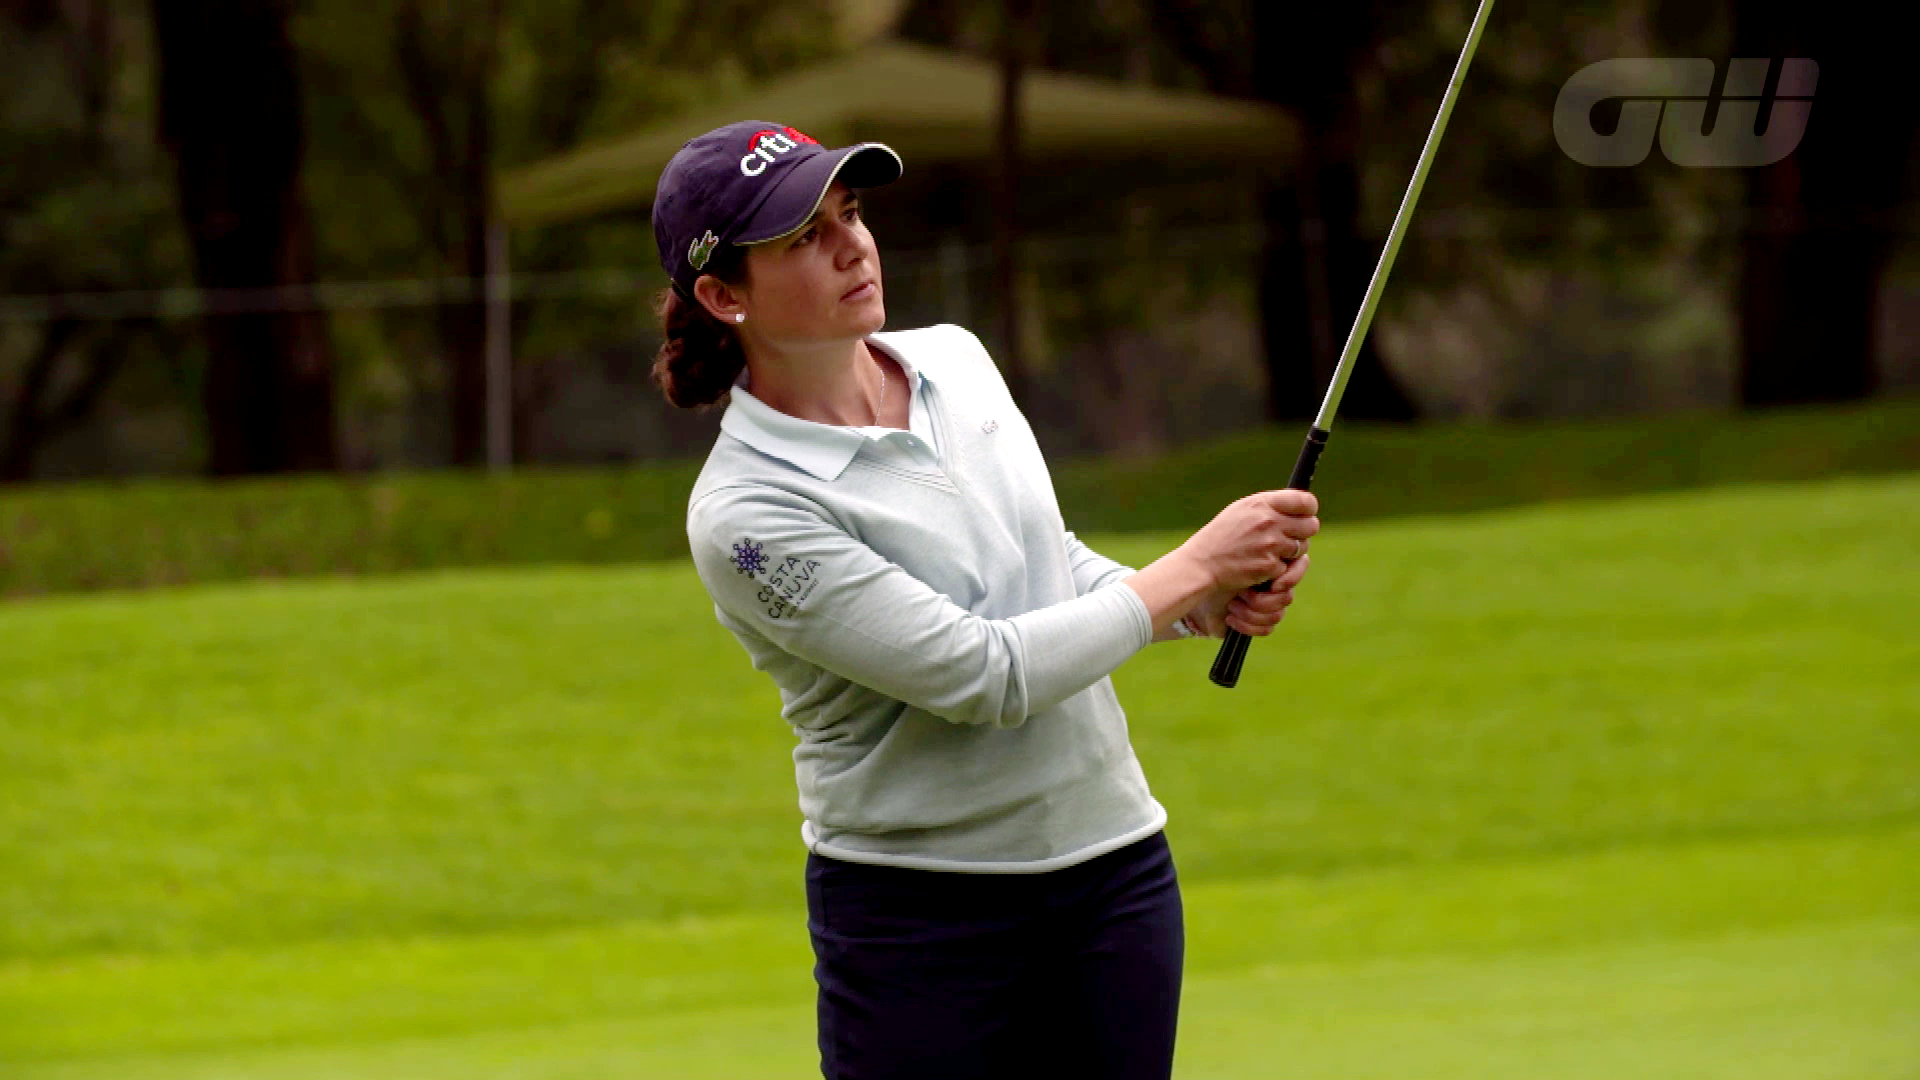 Lorena Ochoa Videos & Photos | Golf Channel